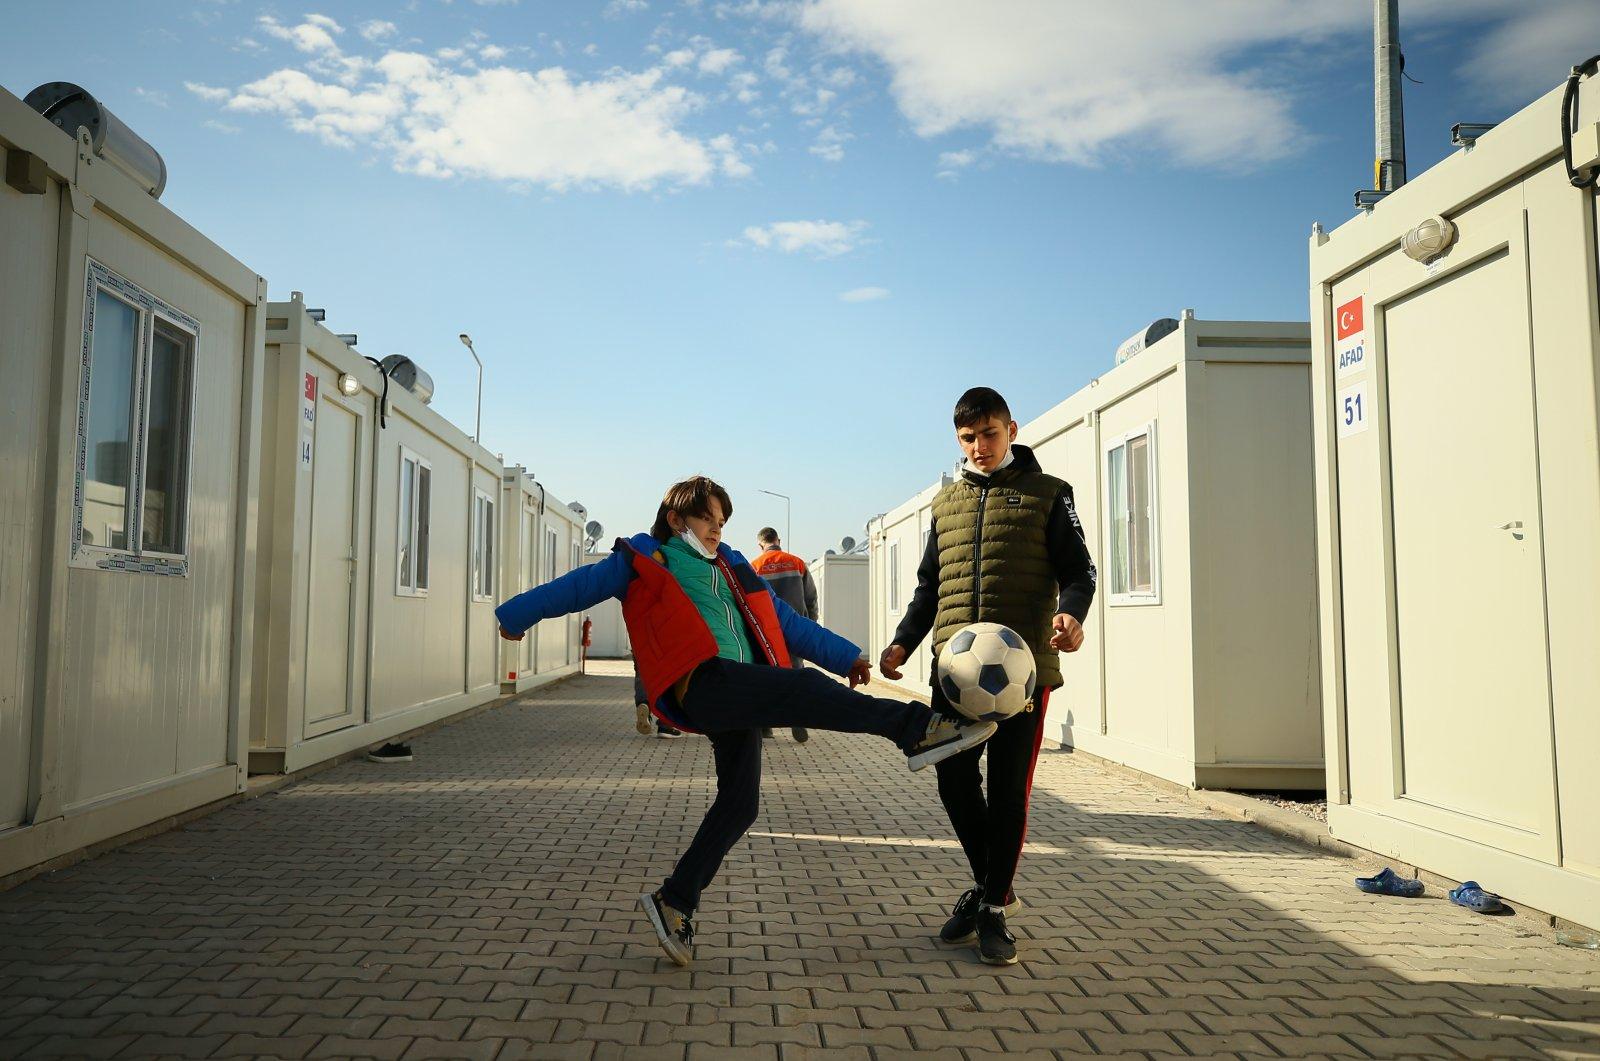 Children play football in an alley between housing units, in Izmir, western Turkey, Nov. 26, 2020. (AA Photo)